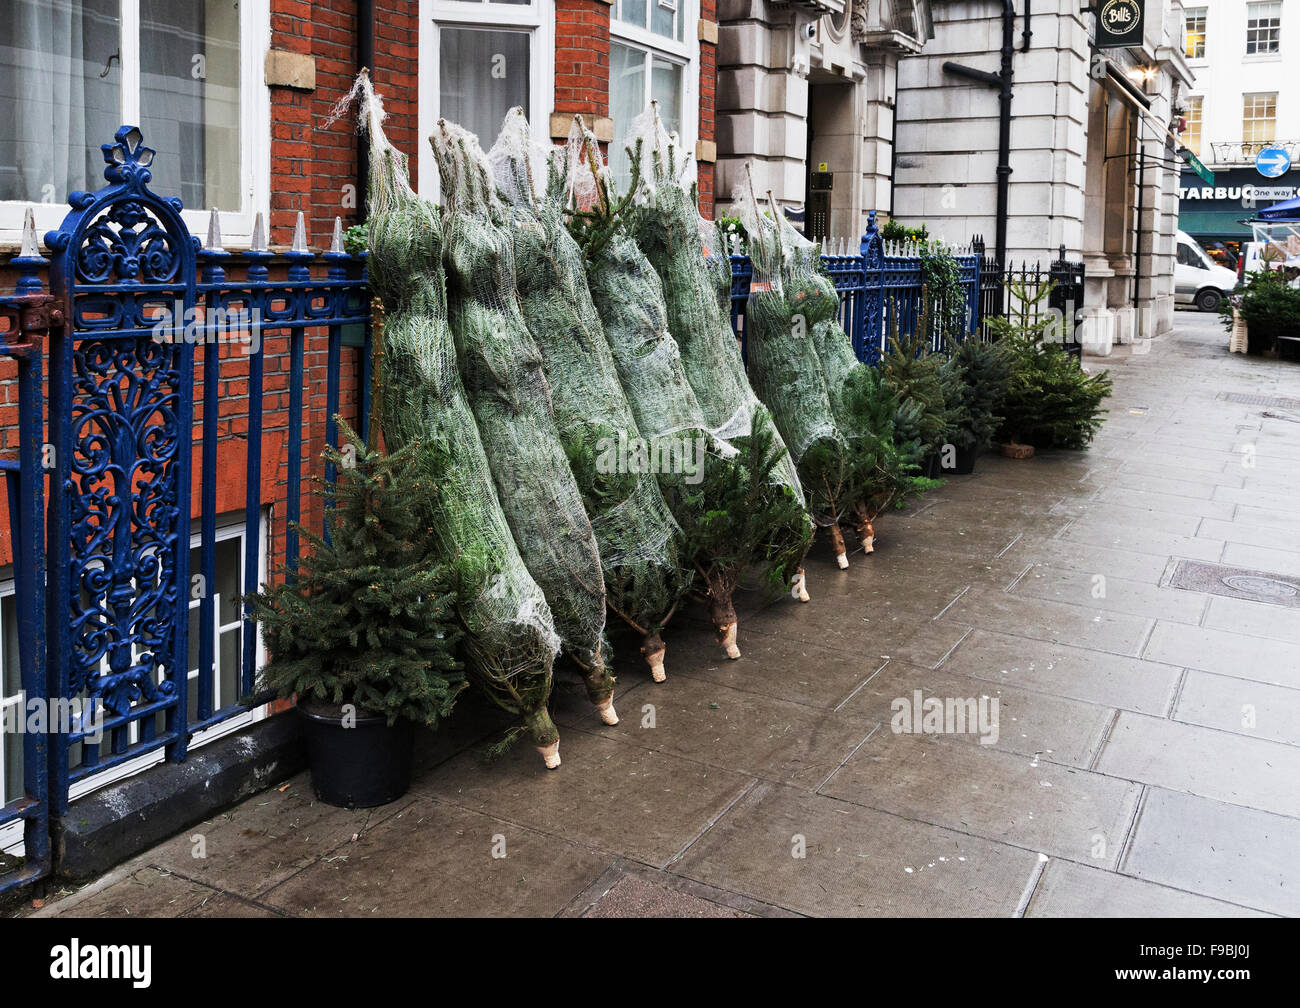 Real Christmas Trees For Sale At Kiosk Bickenhall Street Marylebone